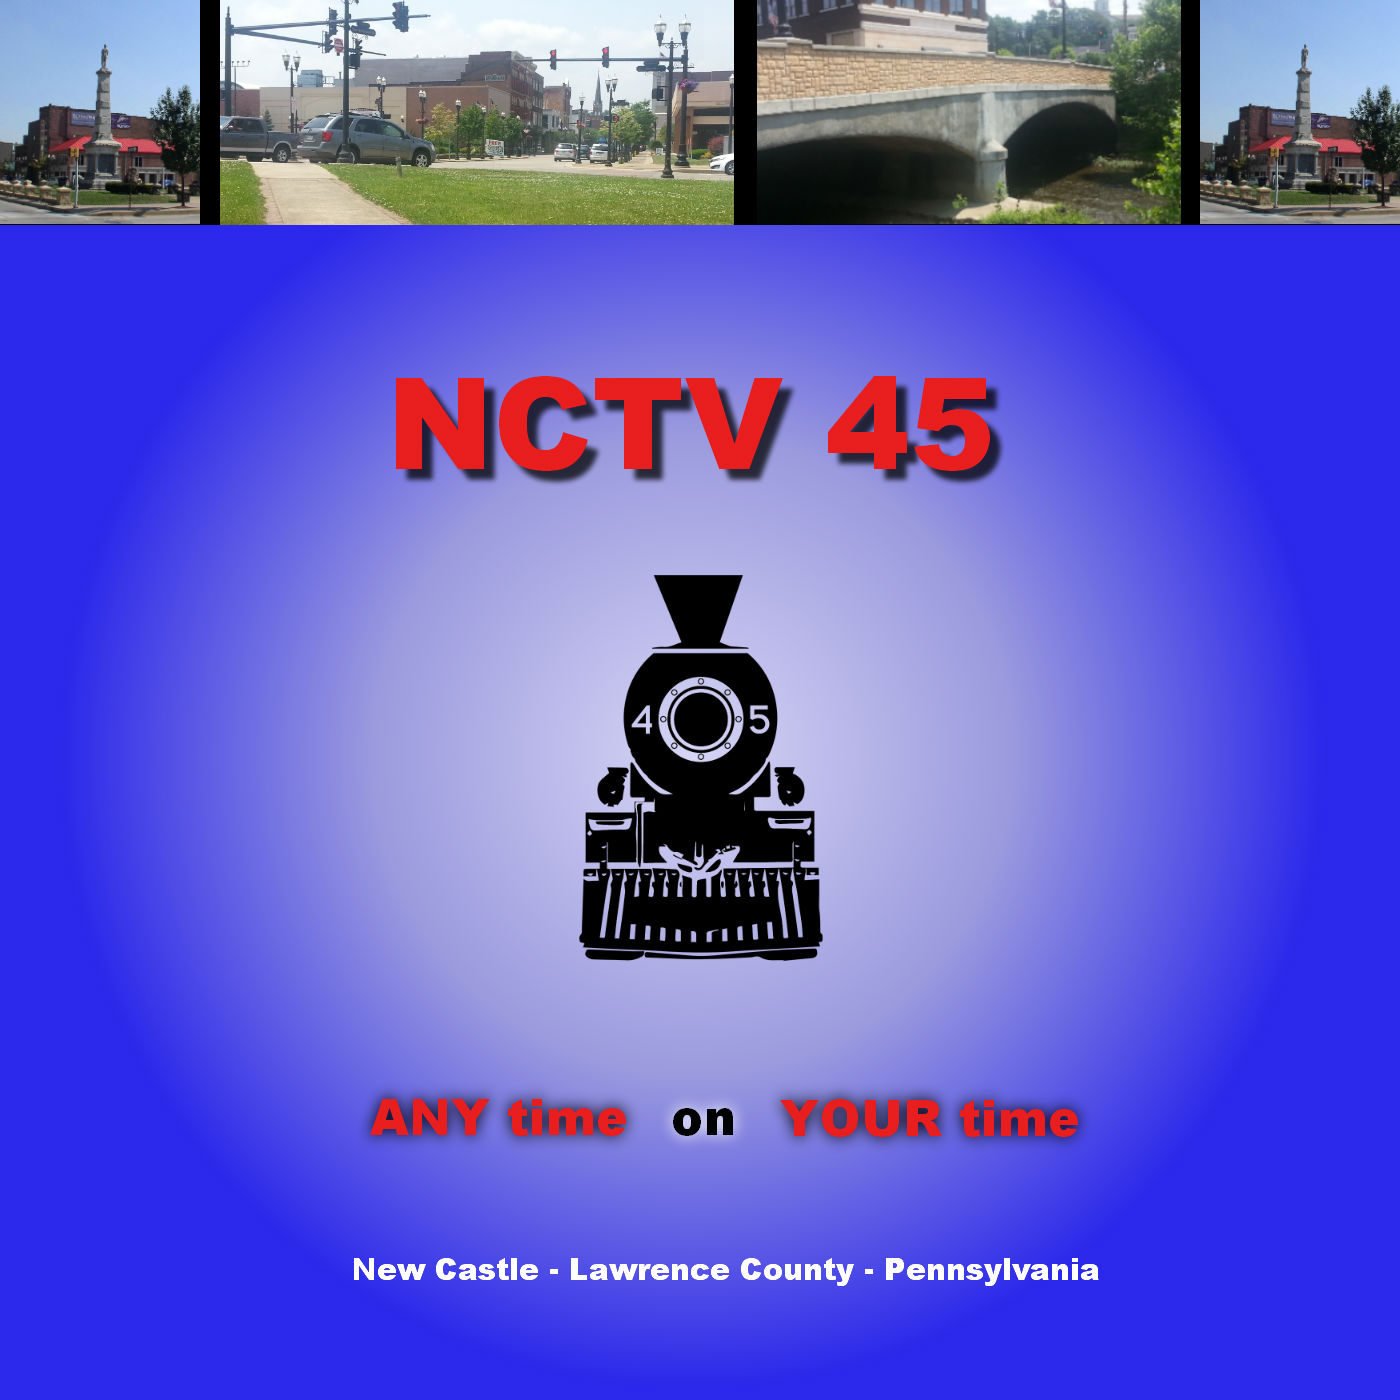 Artwork for NCTV45's Lawrence County Community Happenings Sept 30th thru Oct 1st 2018